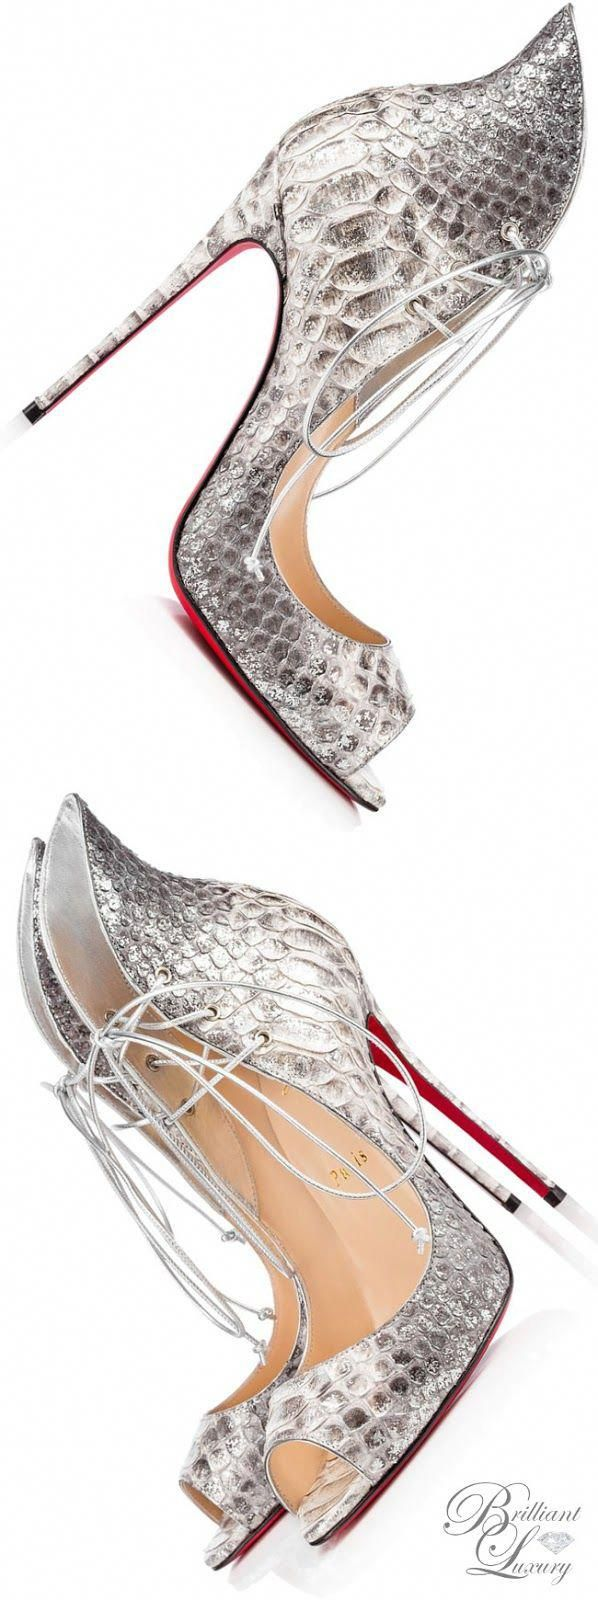 Brilliant Luxury by Emmy DE ♦ Christian Louboutin 'Megavamp' Python Bronte #st…